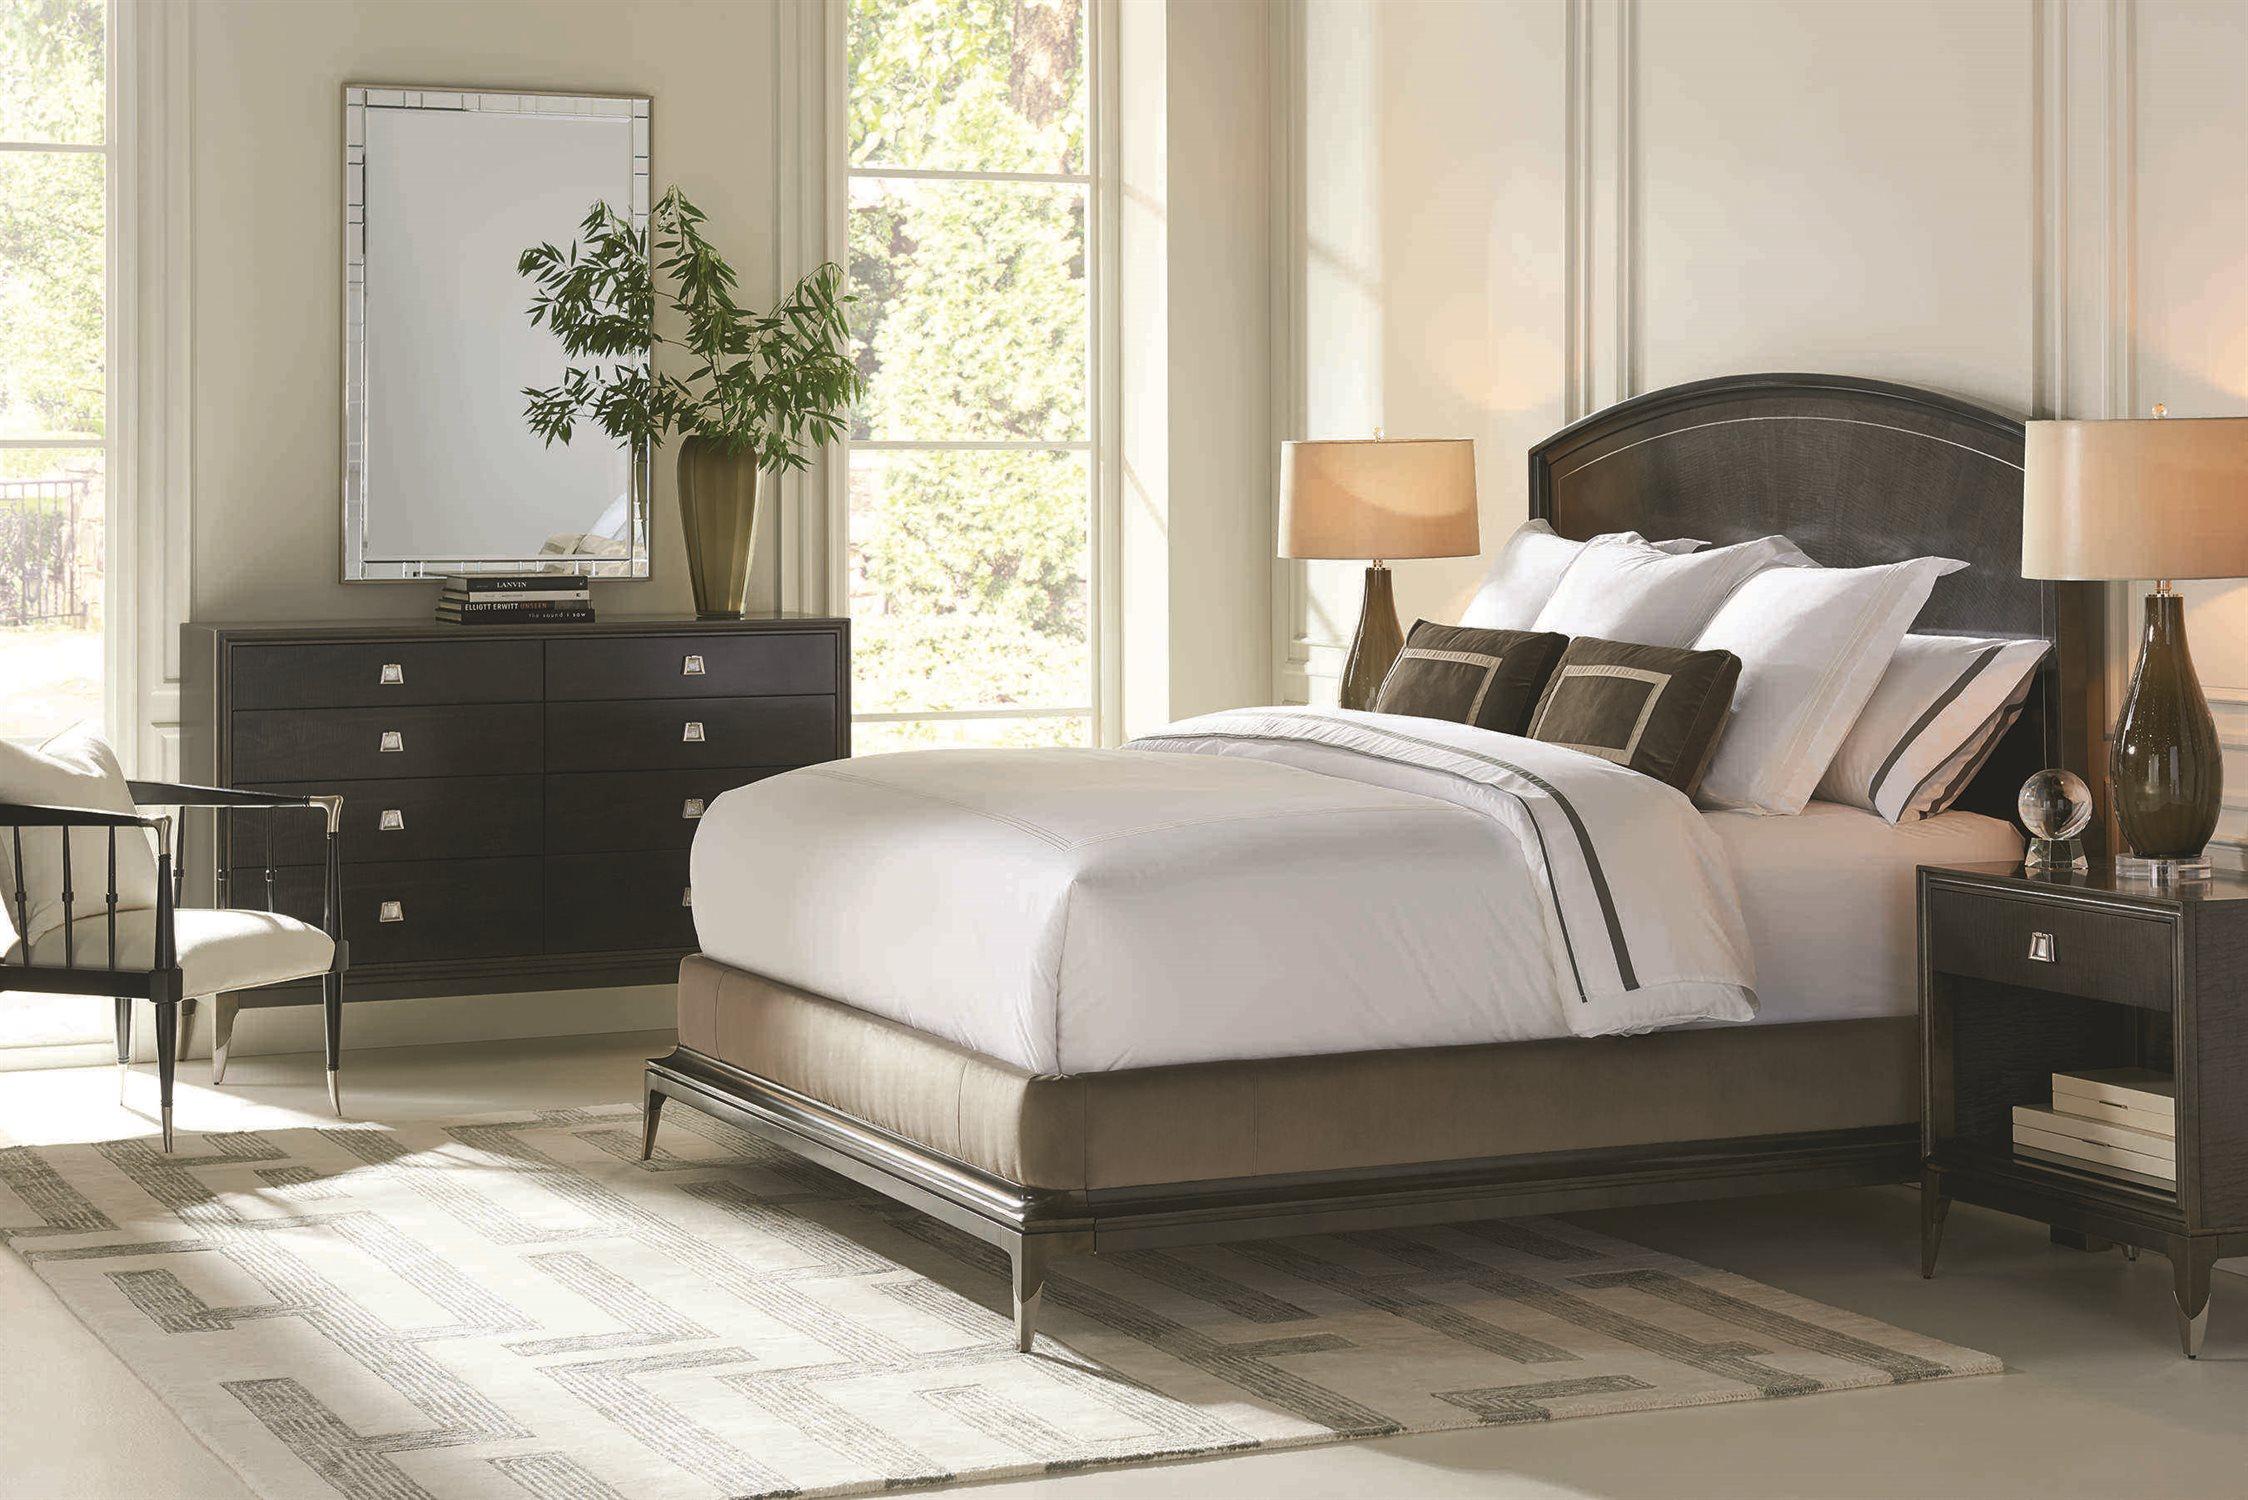 Caracole Classic Bedroom Set   CACCLA4171010SET3